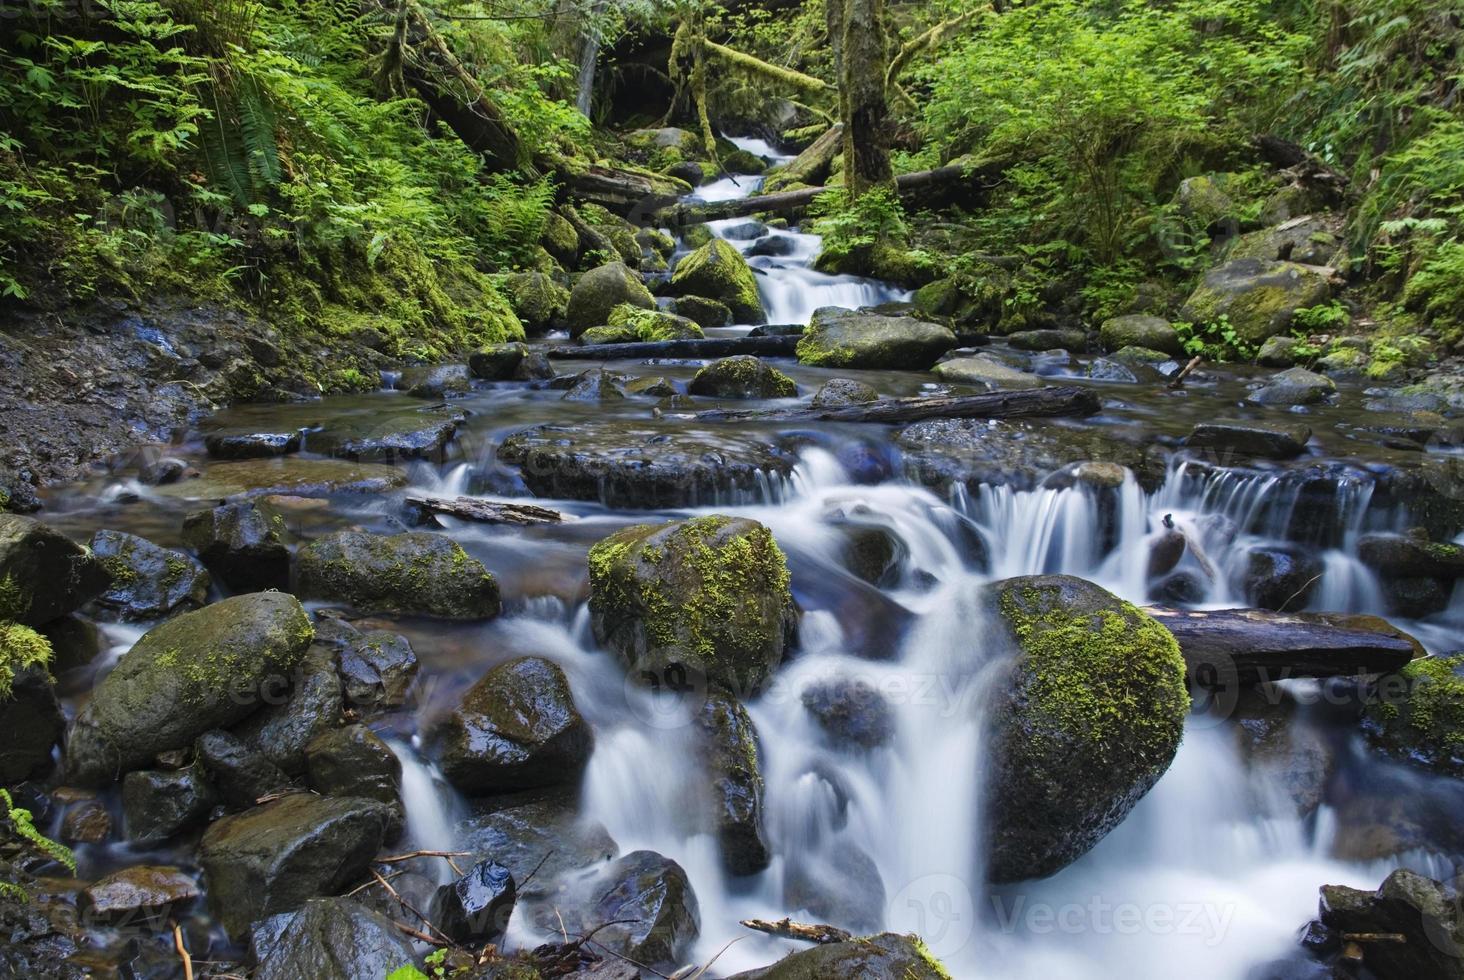 agua hermosa foto